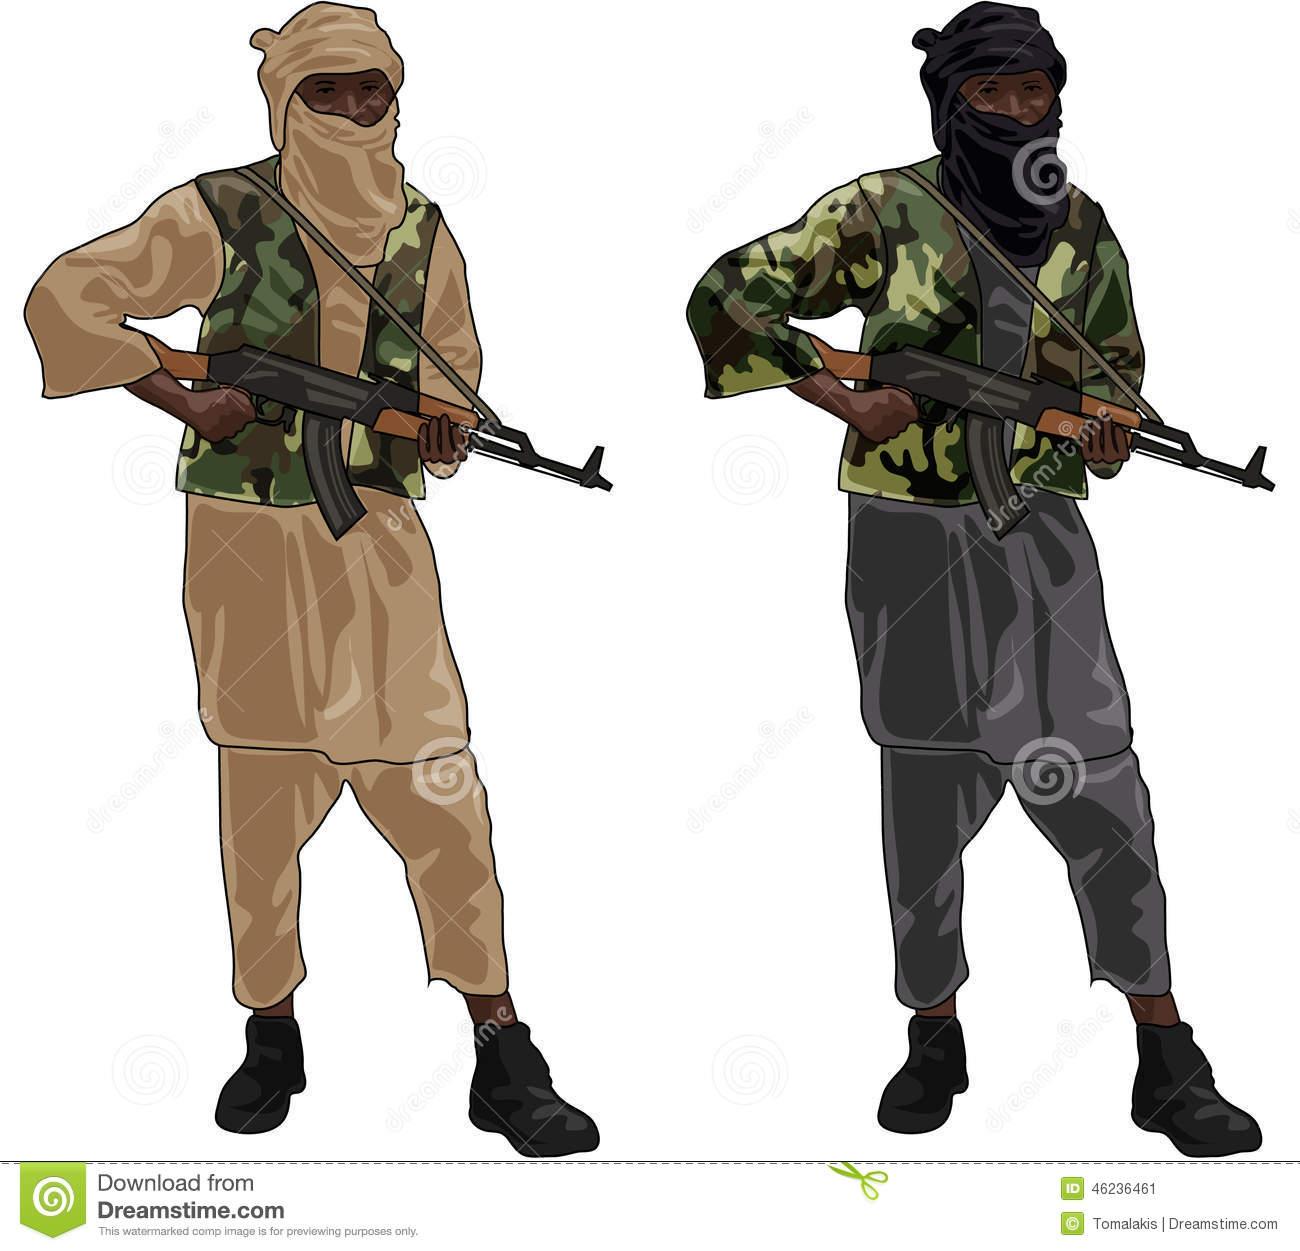 Muslim terrorist clipart.